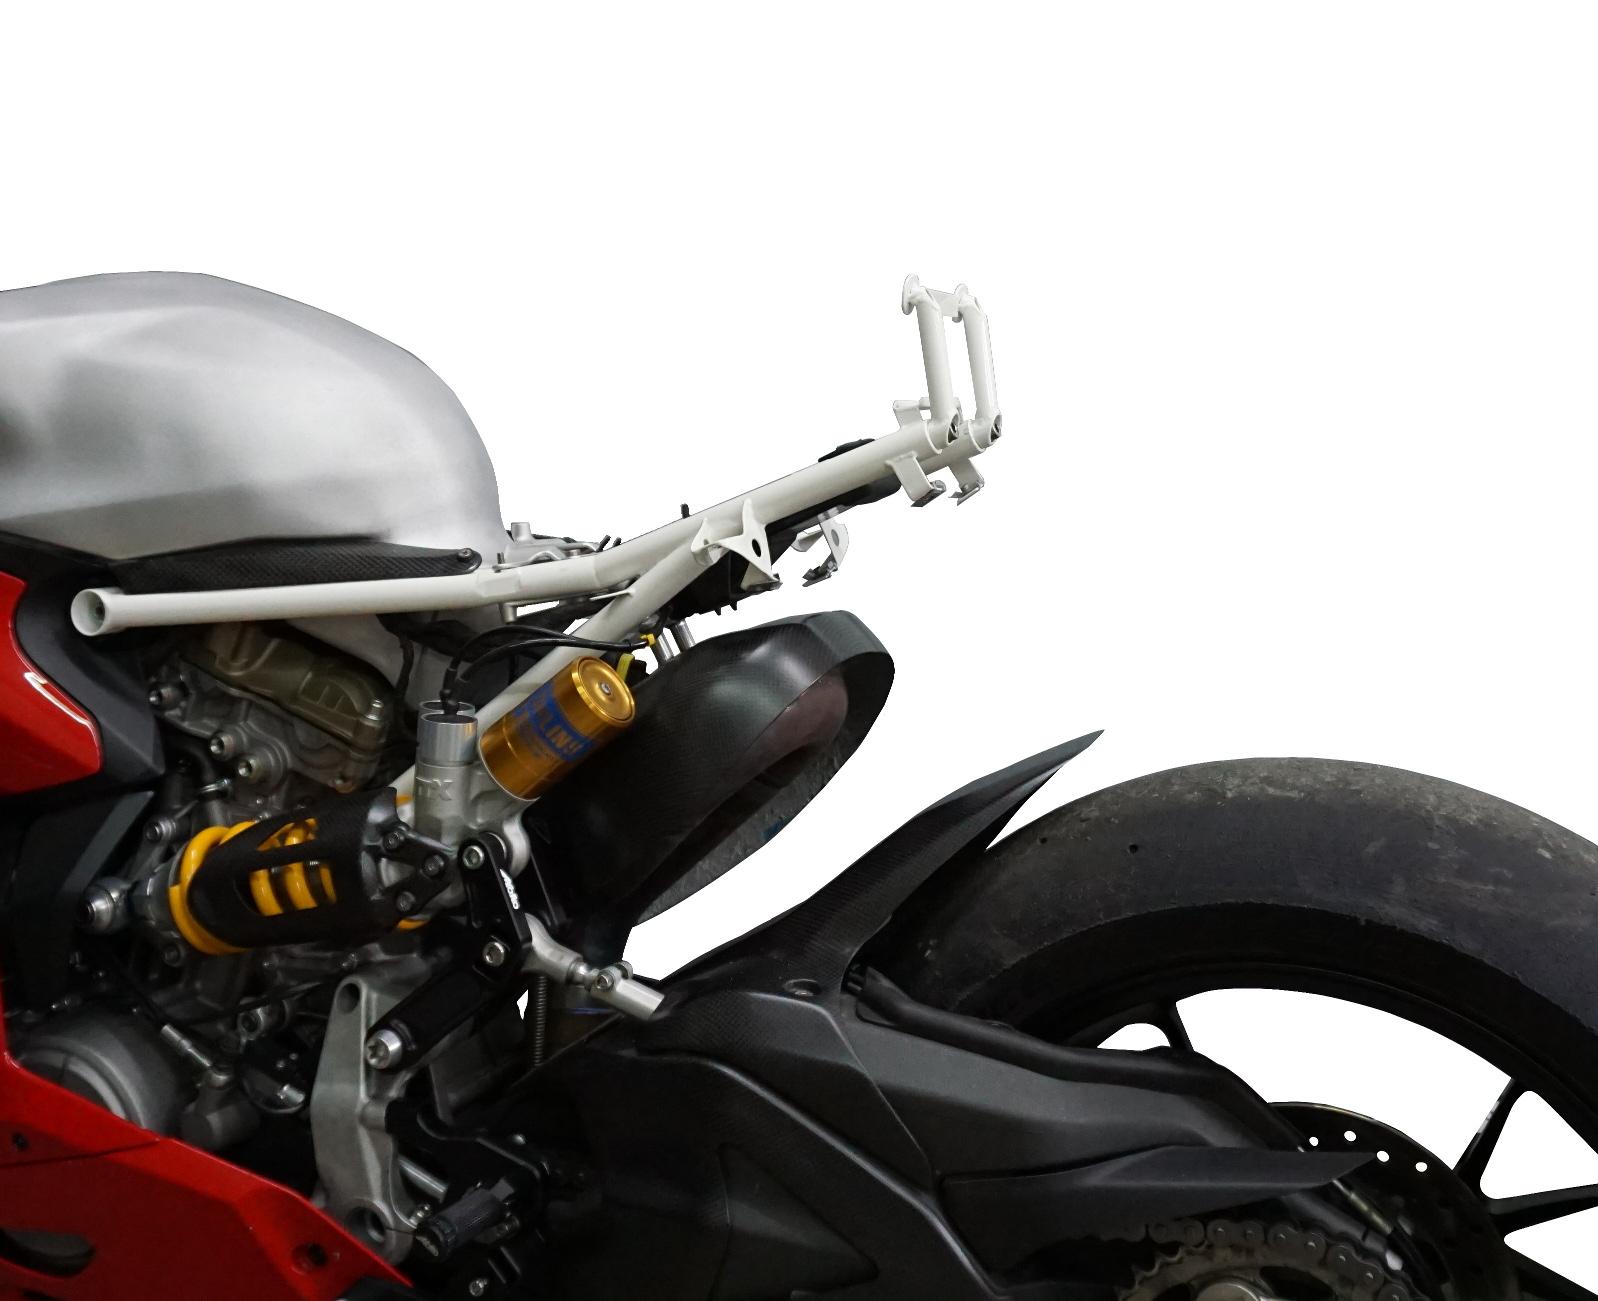 Heckrahmen 08.002.11 Moko Ducati Panigale